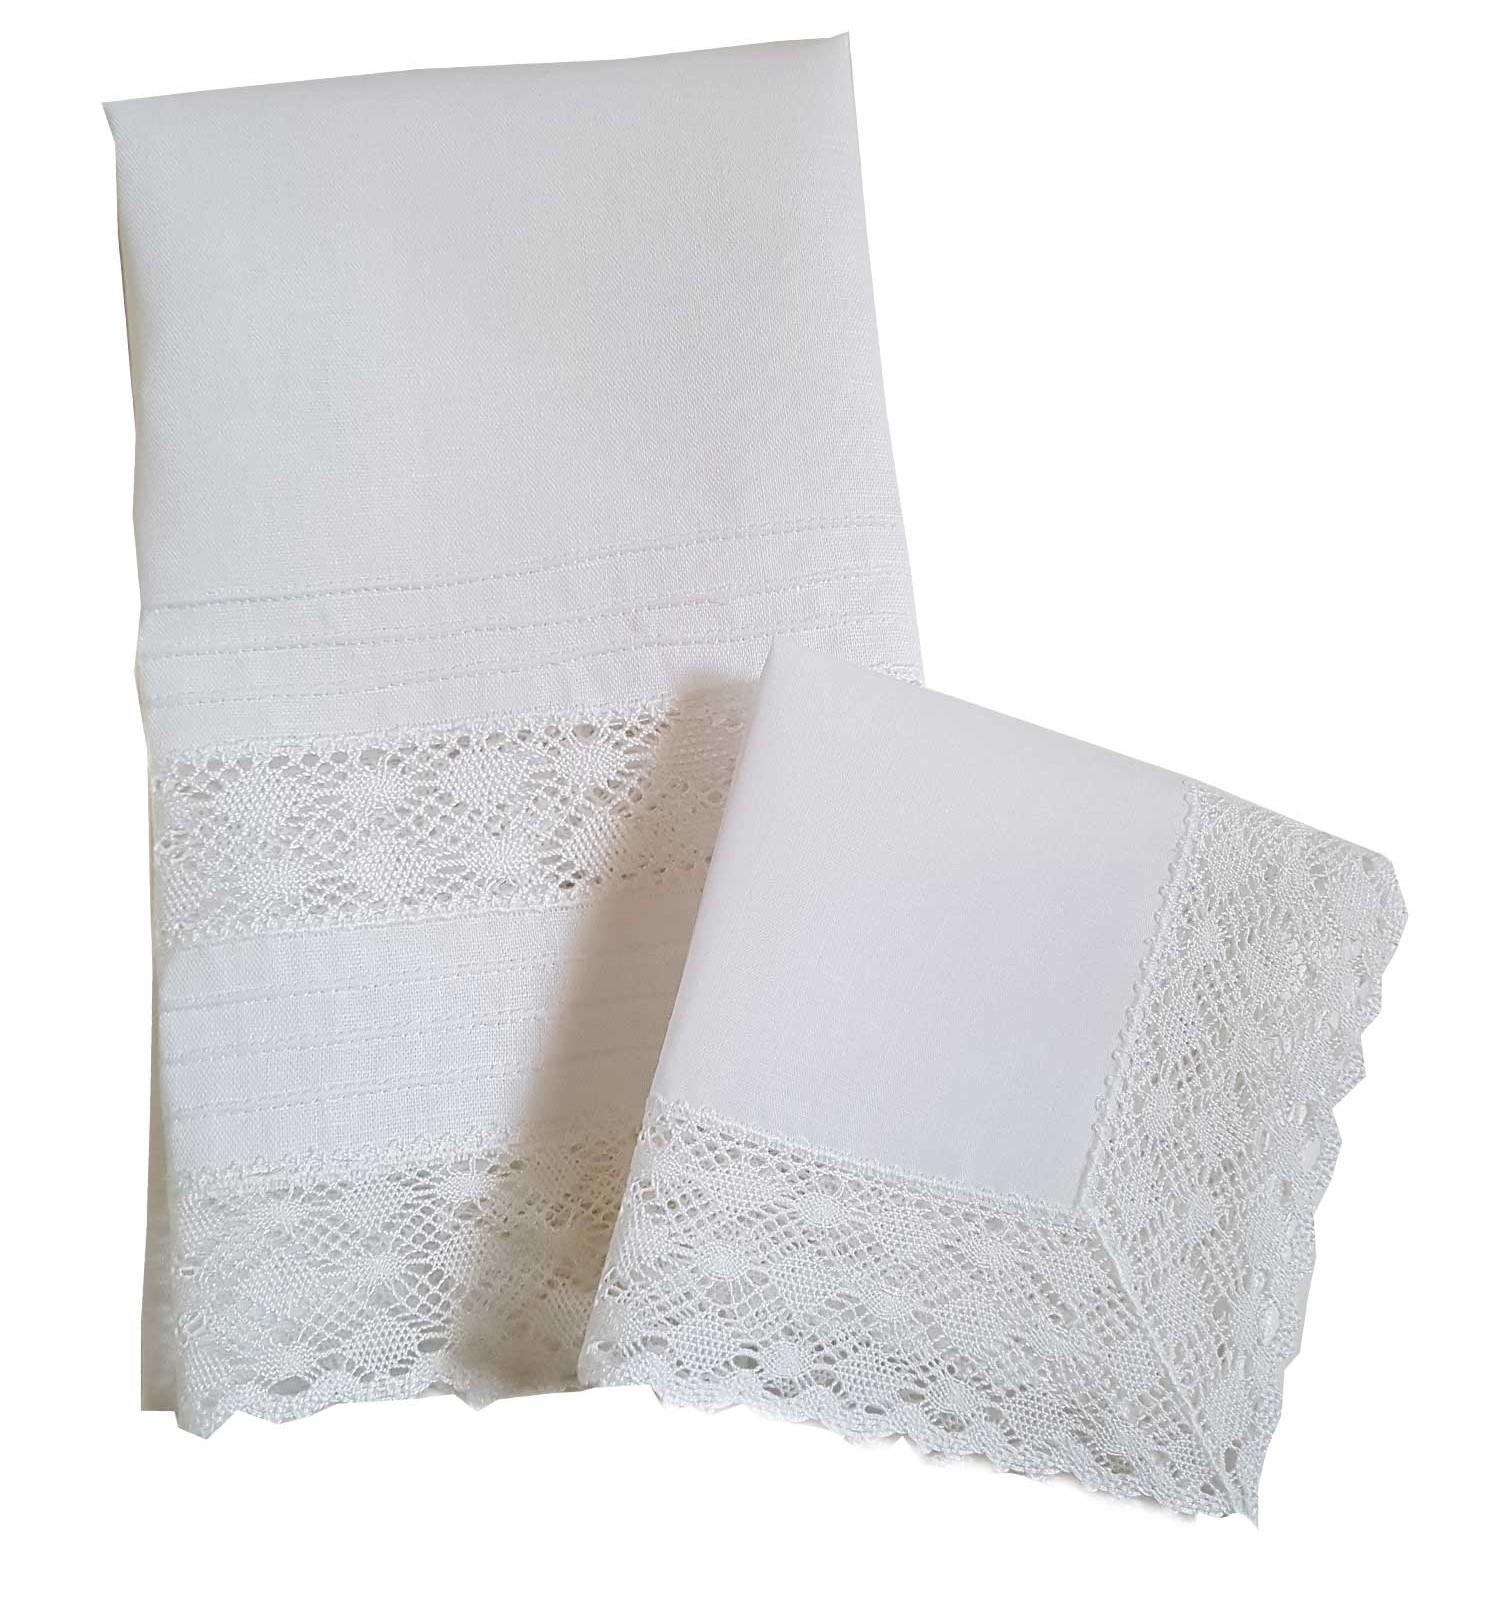 Pack de bautizo, toalla y pañuelo de rombos